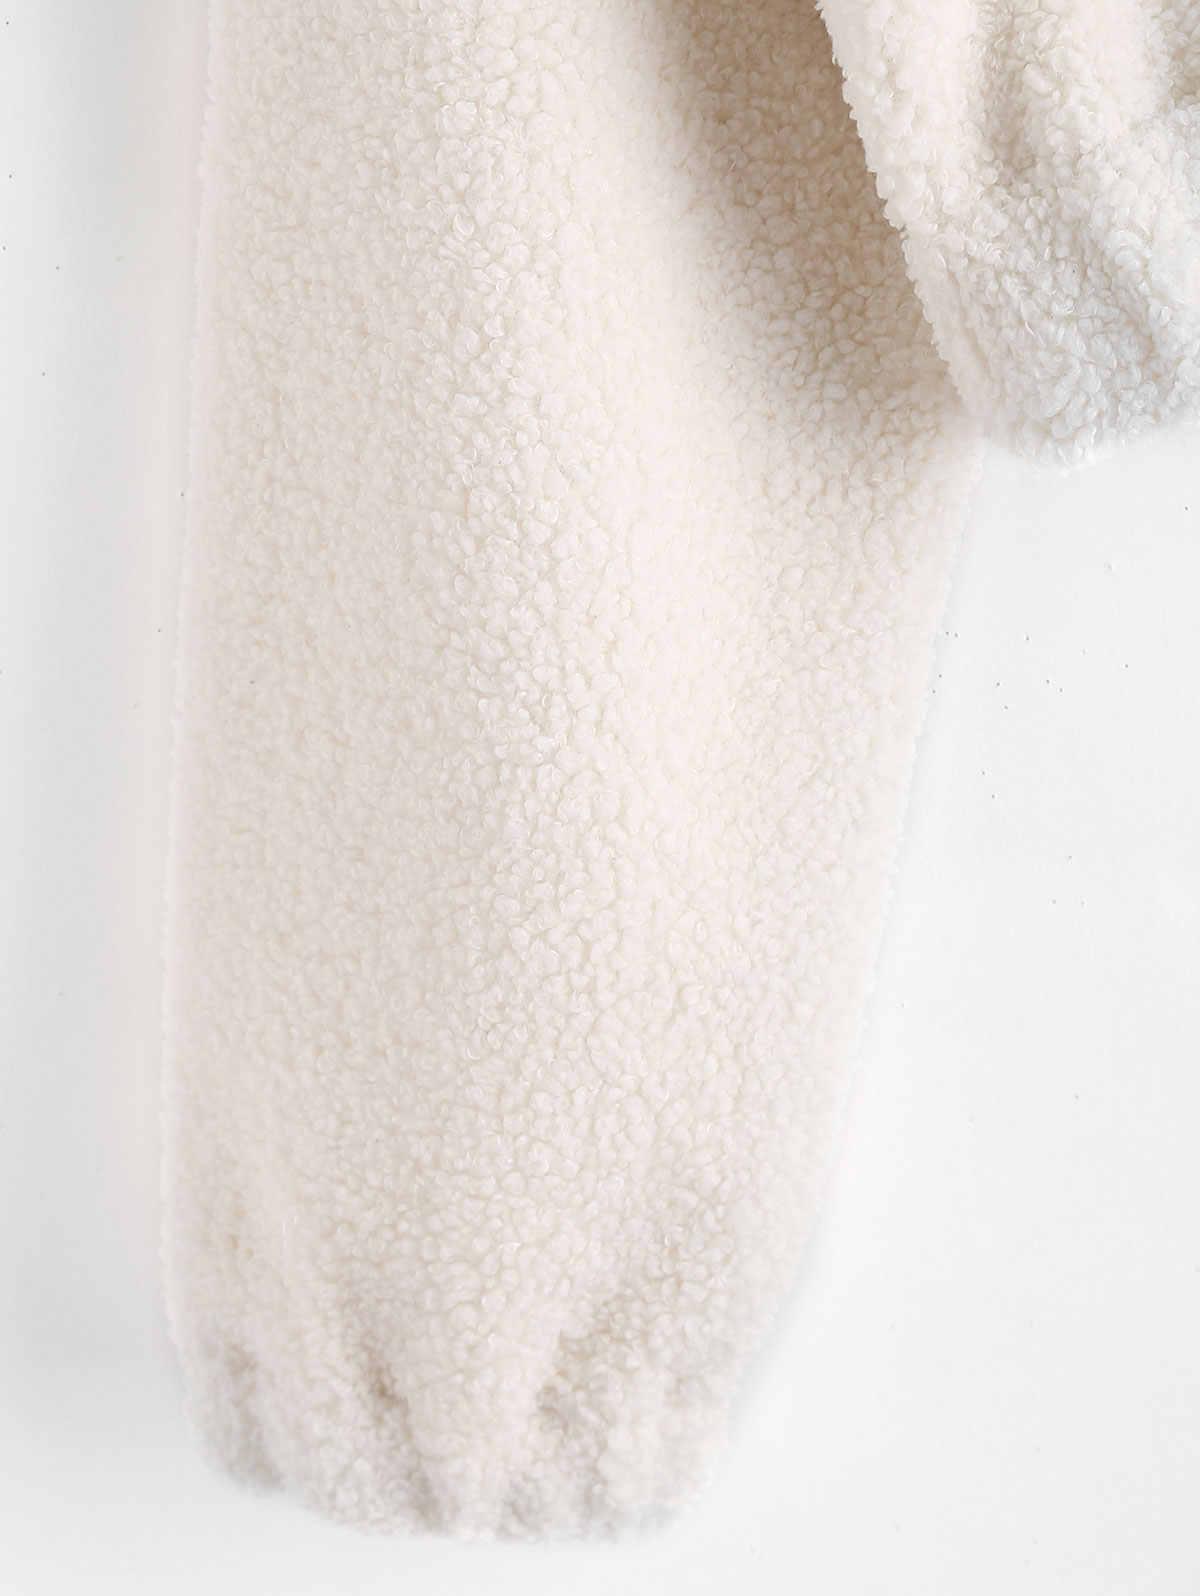 ... AZULINA Half Zip Plain Faux Fur Sweatshirt Mock Neck Sweatshirt Sherpa Sweatshirts  Hoodies Women Tops Pullovers f07bb164c